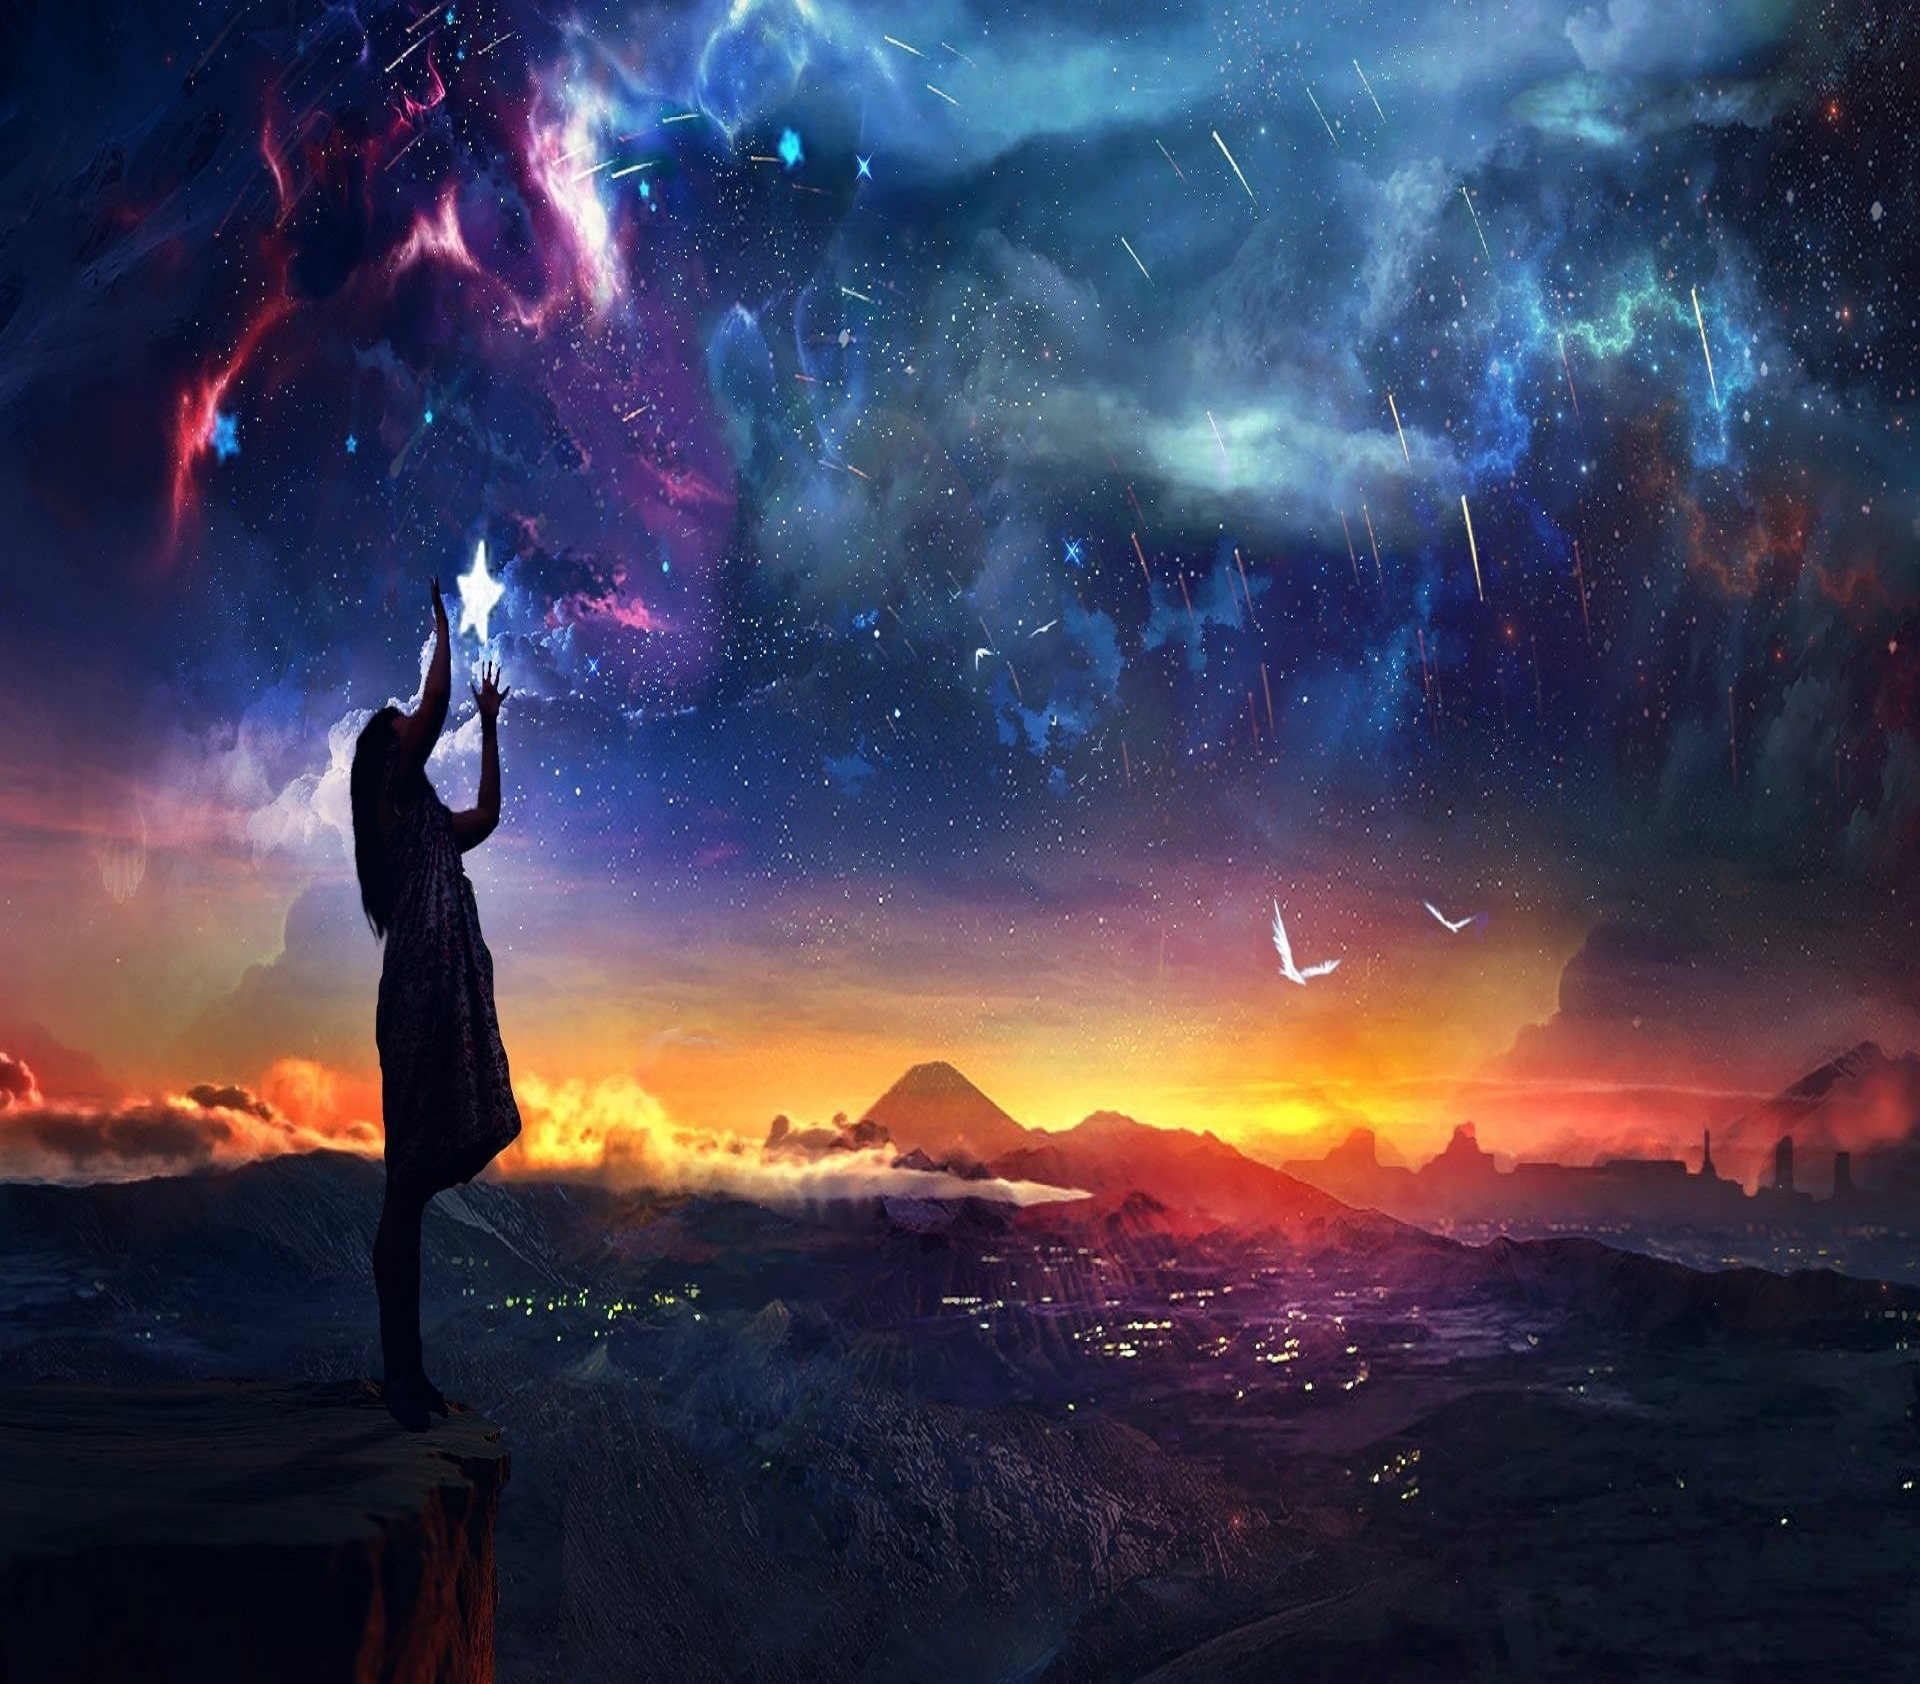 Return to the stars zastavki com Fantasy_Woman_straightens_stars_in_the_sky_098460_